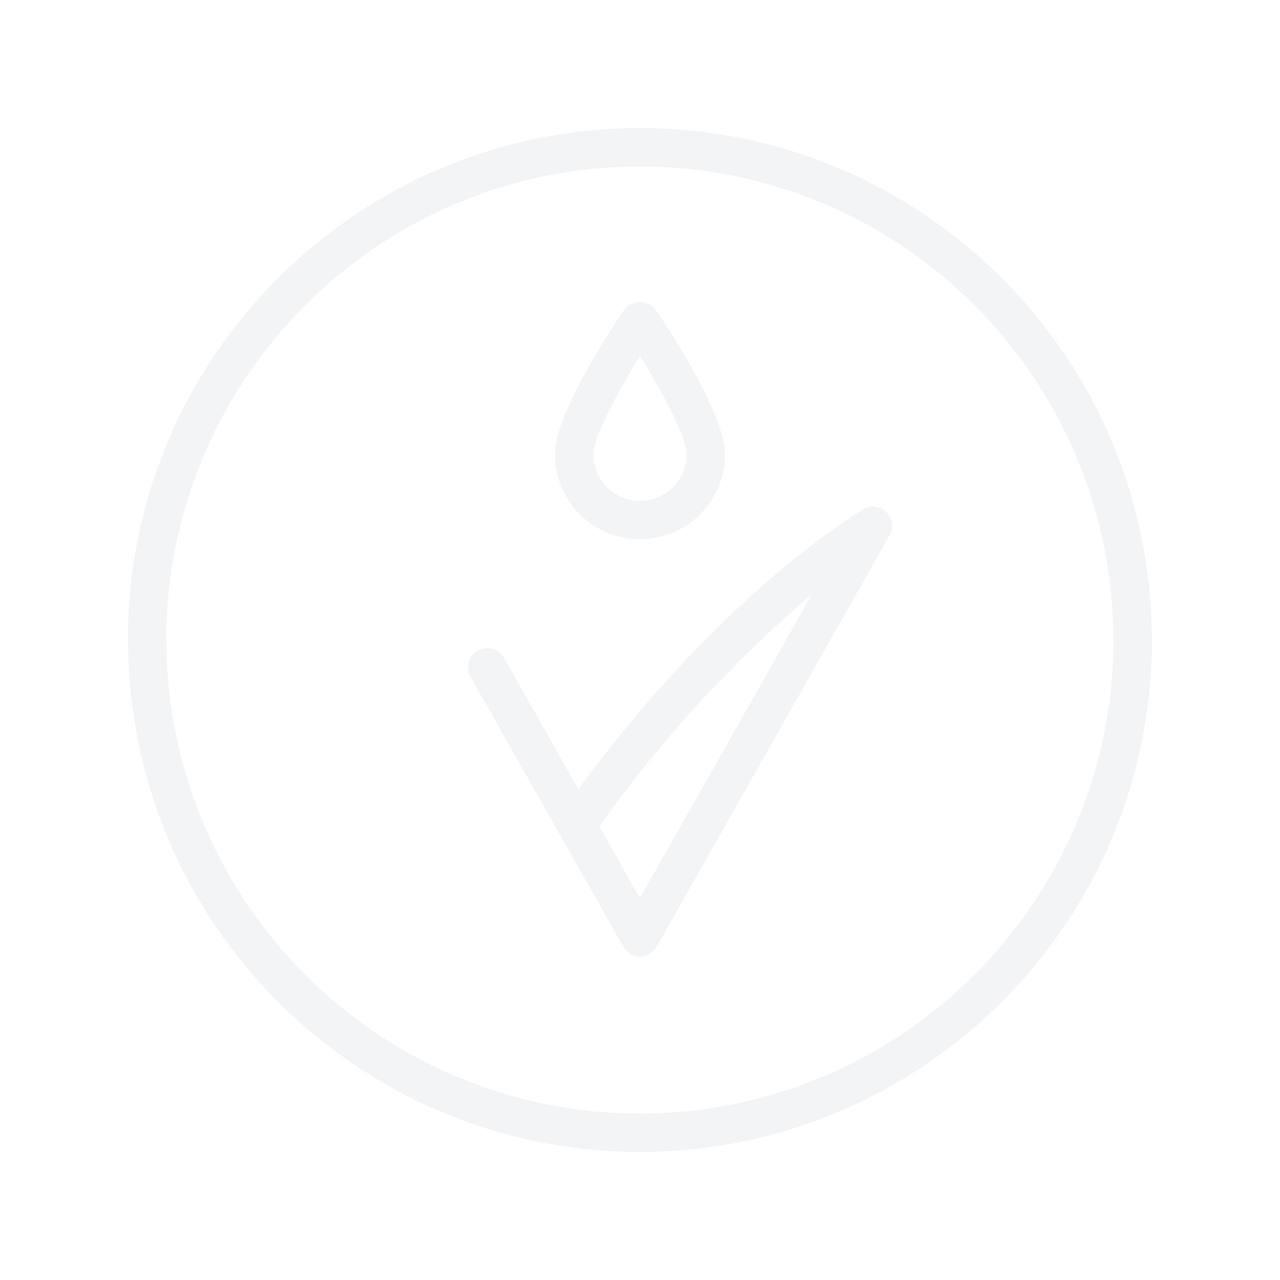 Bvlgari Man In Black 60ml Eau De Parfum Gift Set Loverte Edp 100ml